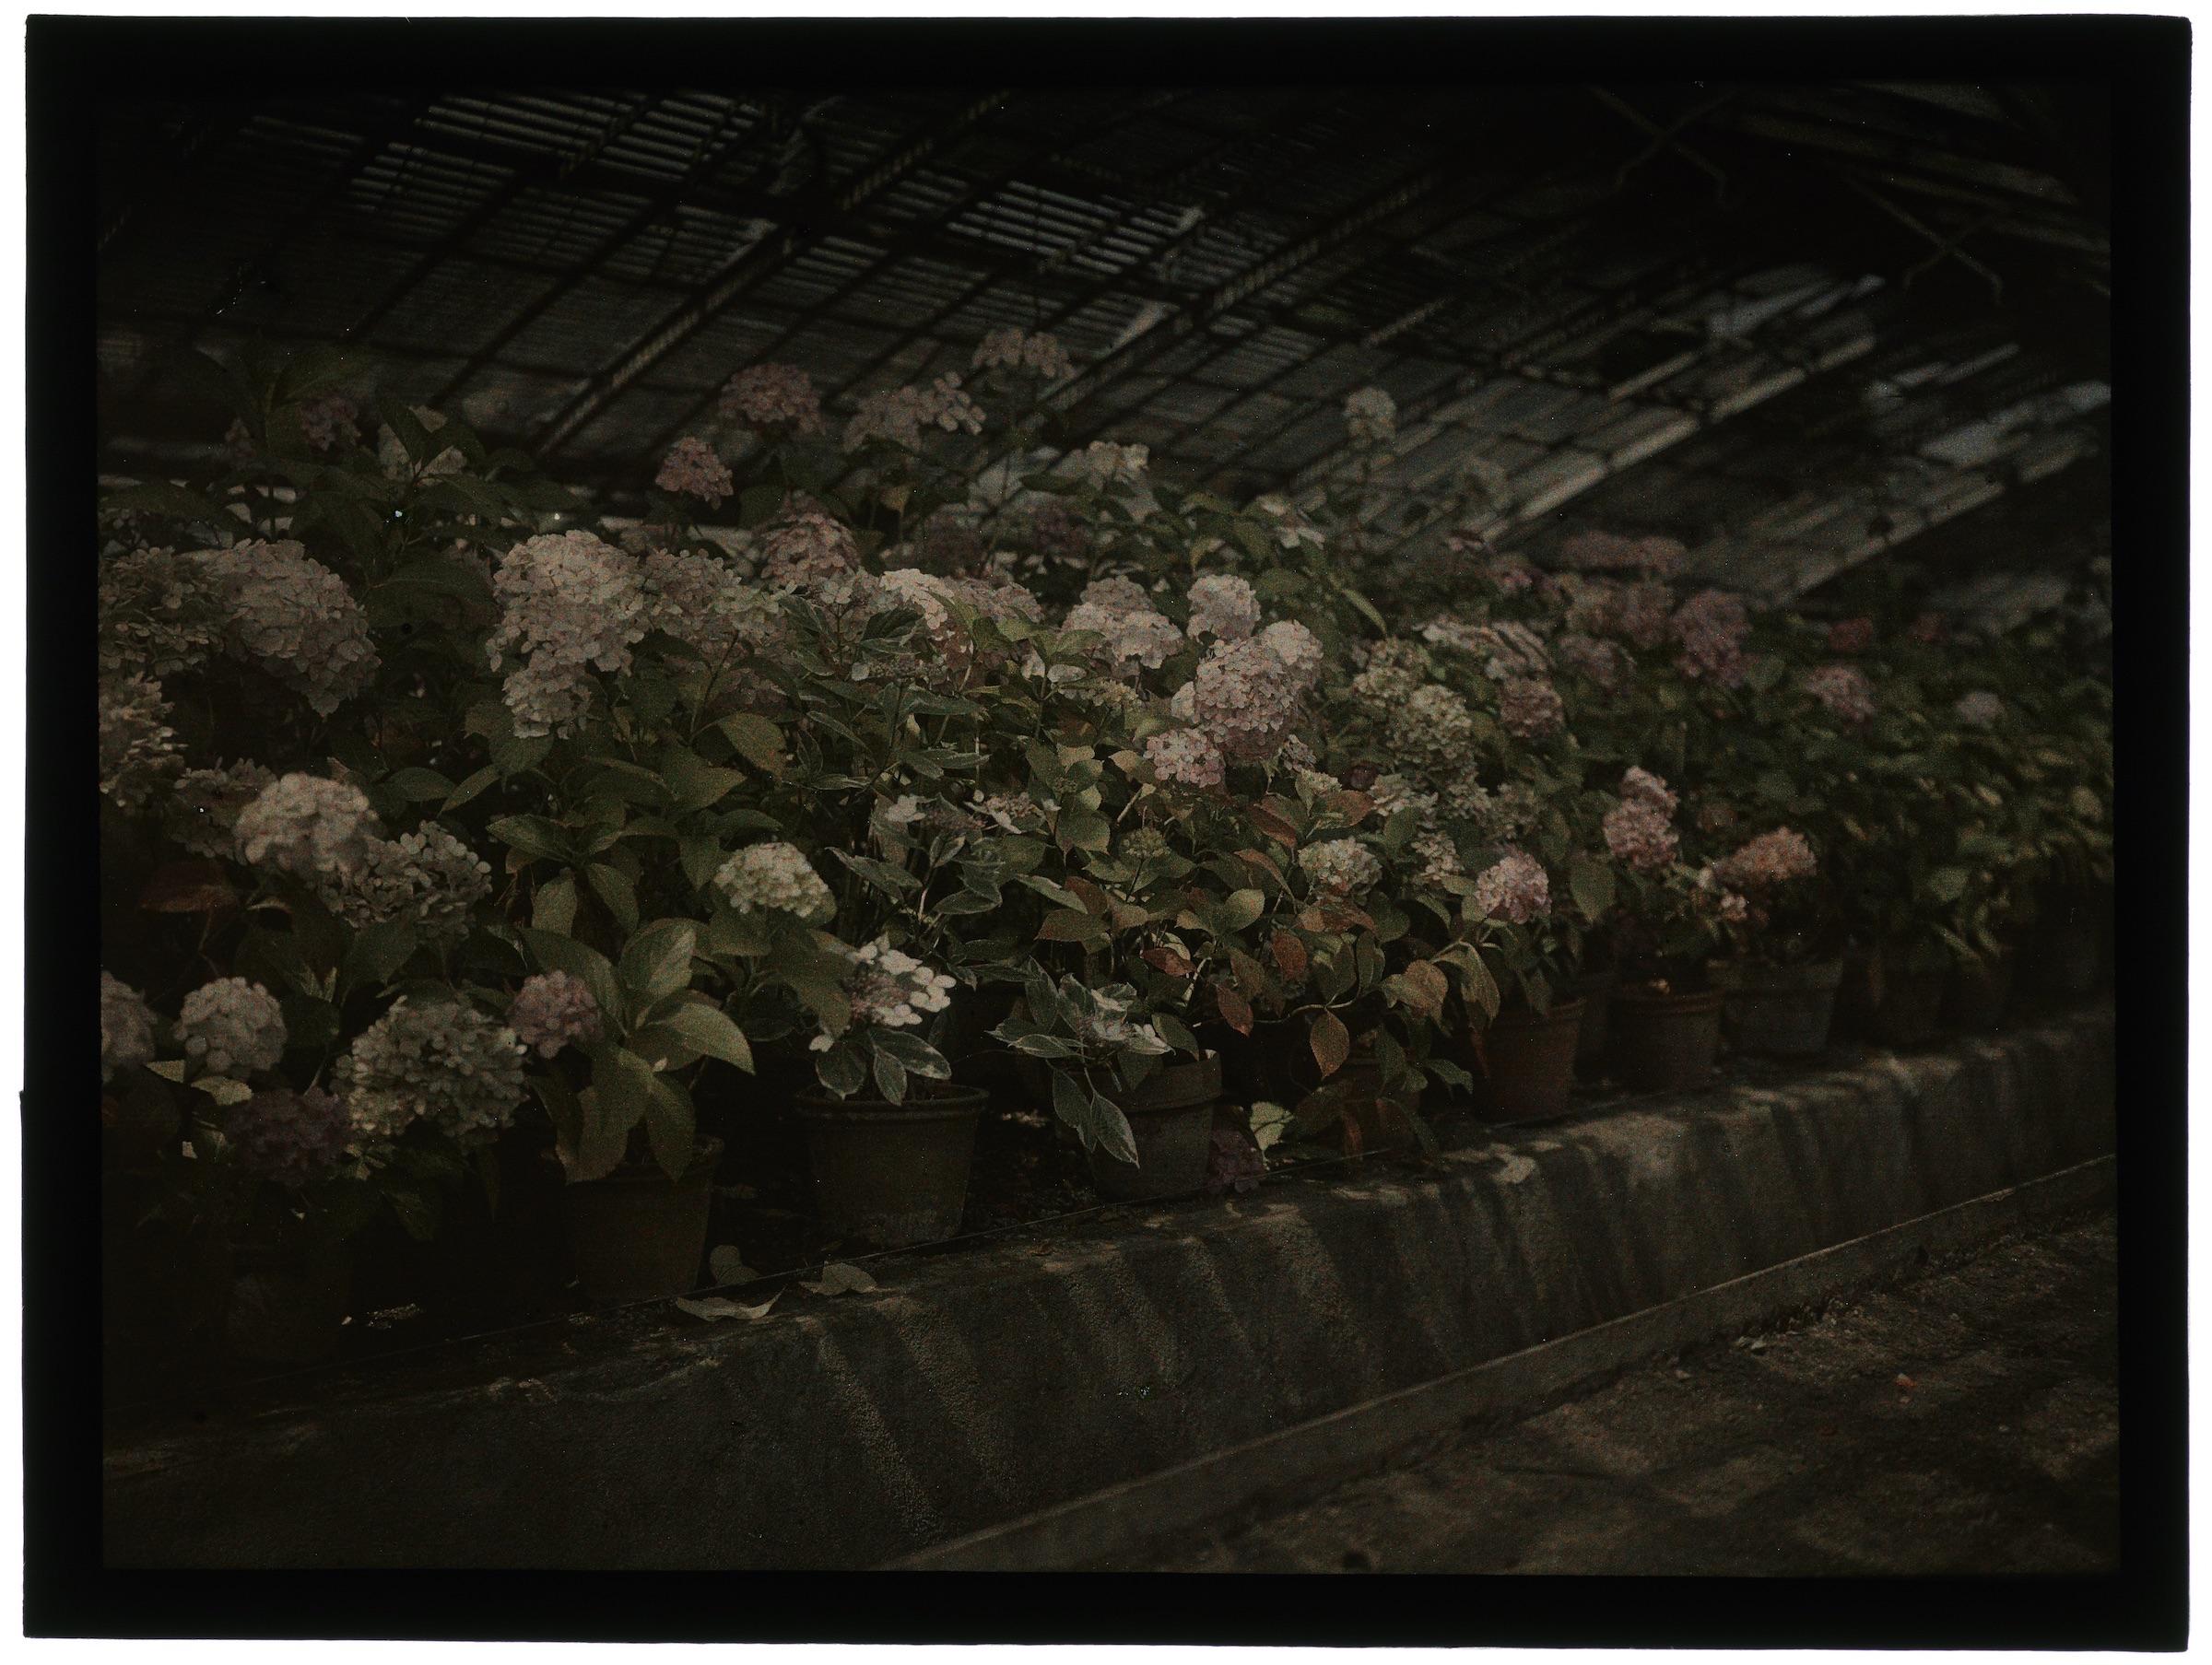 Fleurs dans la serre arrondie